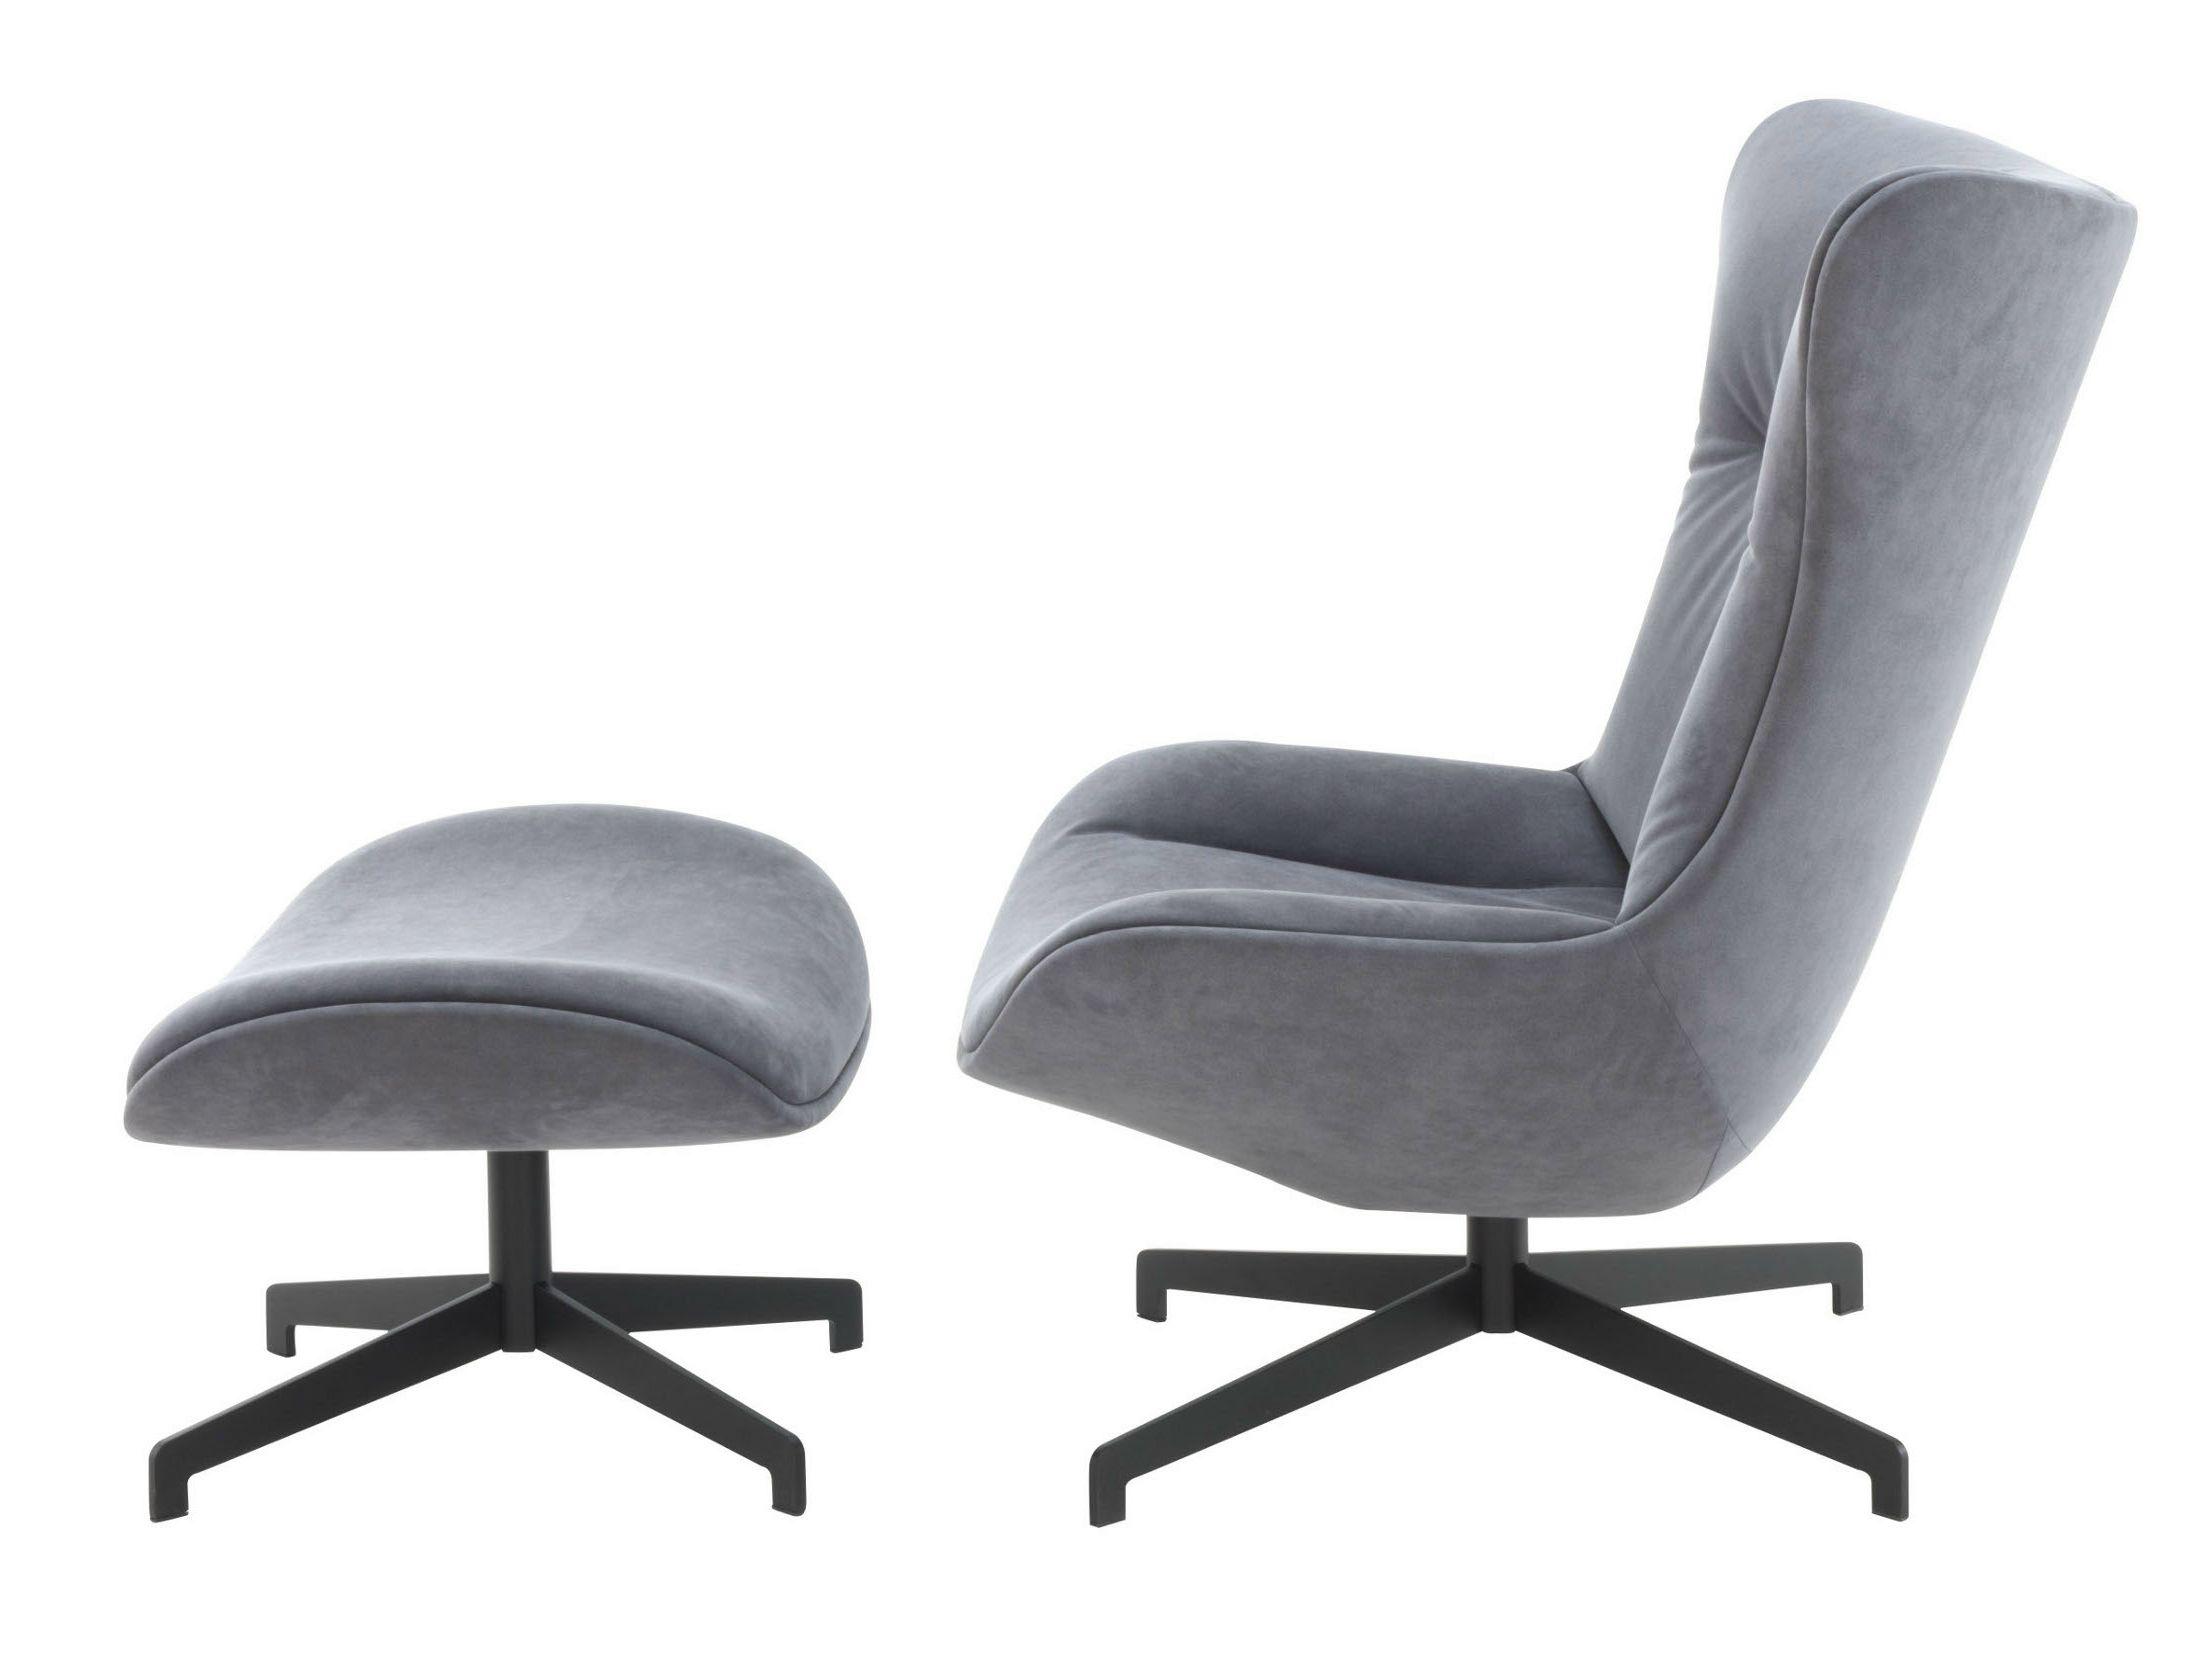 fauteuil pivotant rembourr amy by roset italia design claudio dondoli marco poci. Black Bedroom Furniture Sets. Home Design Ideas